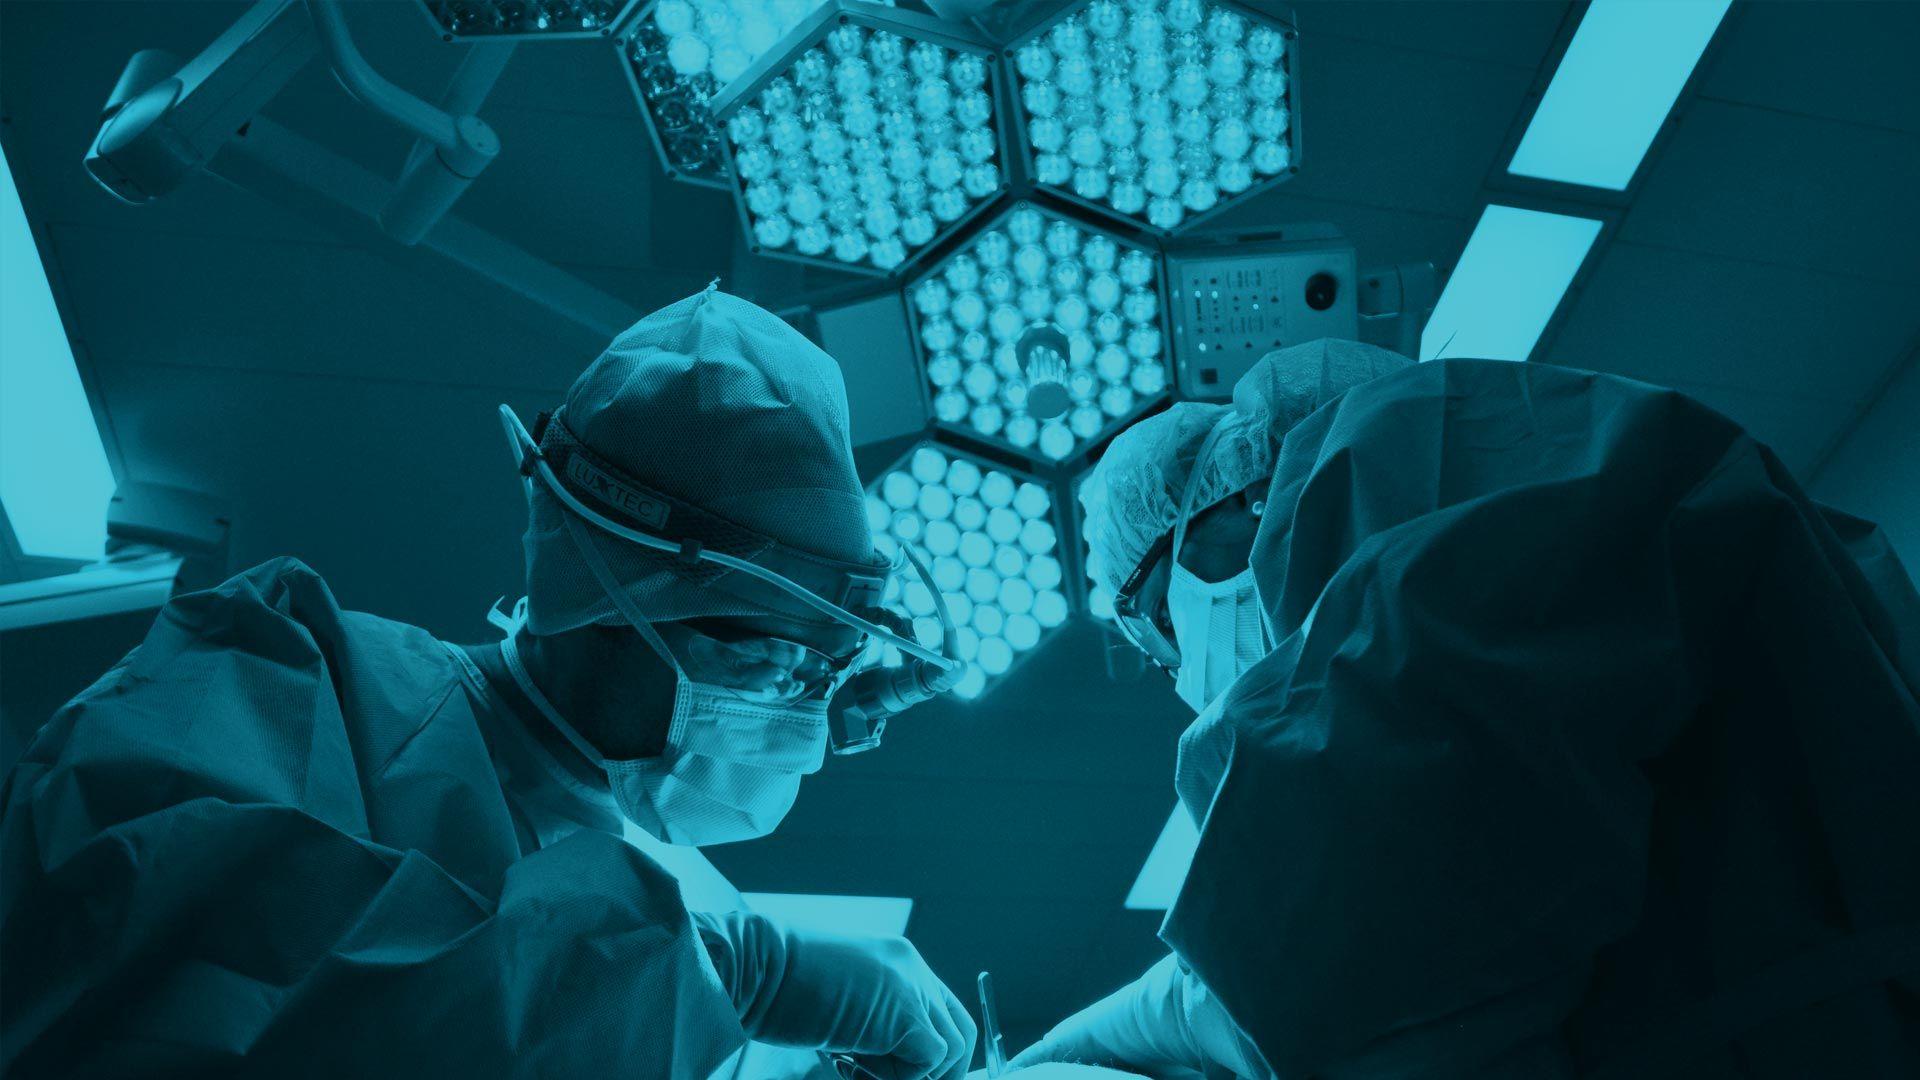 Chirurgia 1 Small